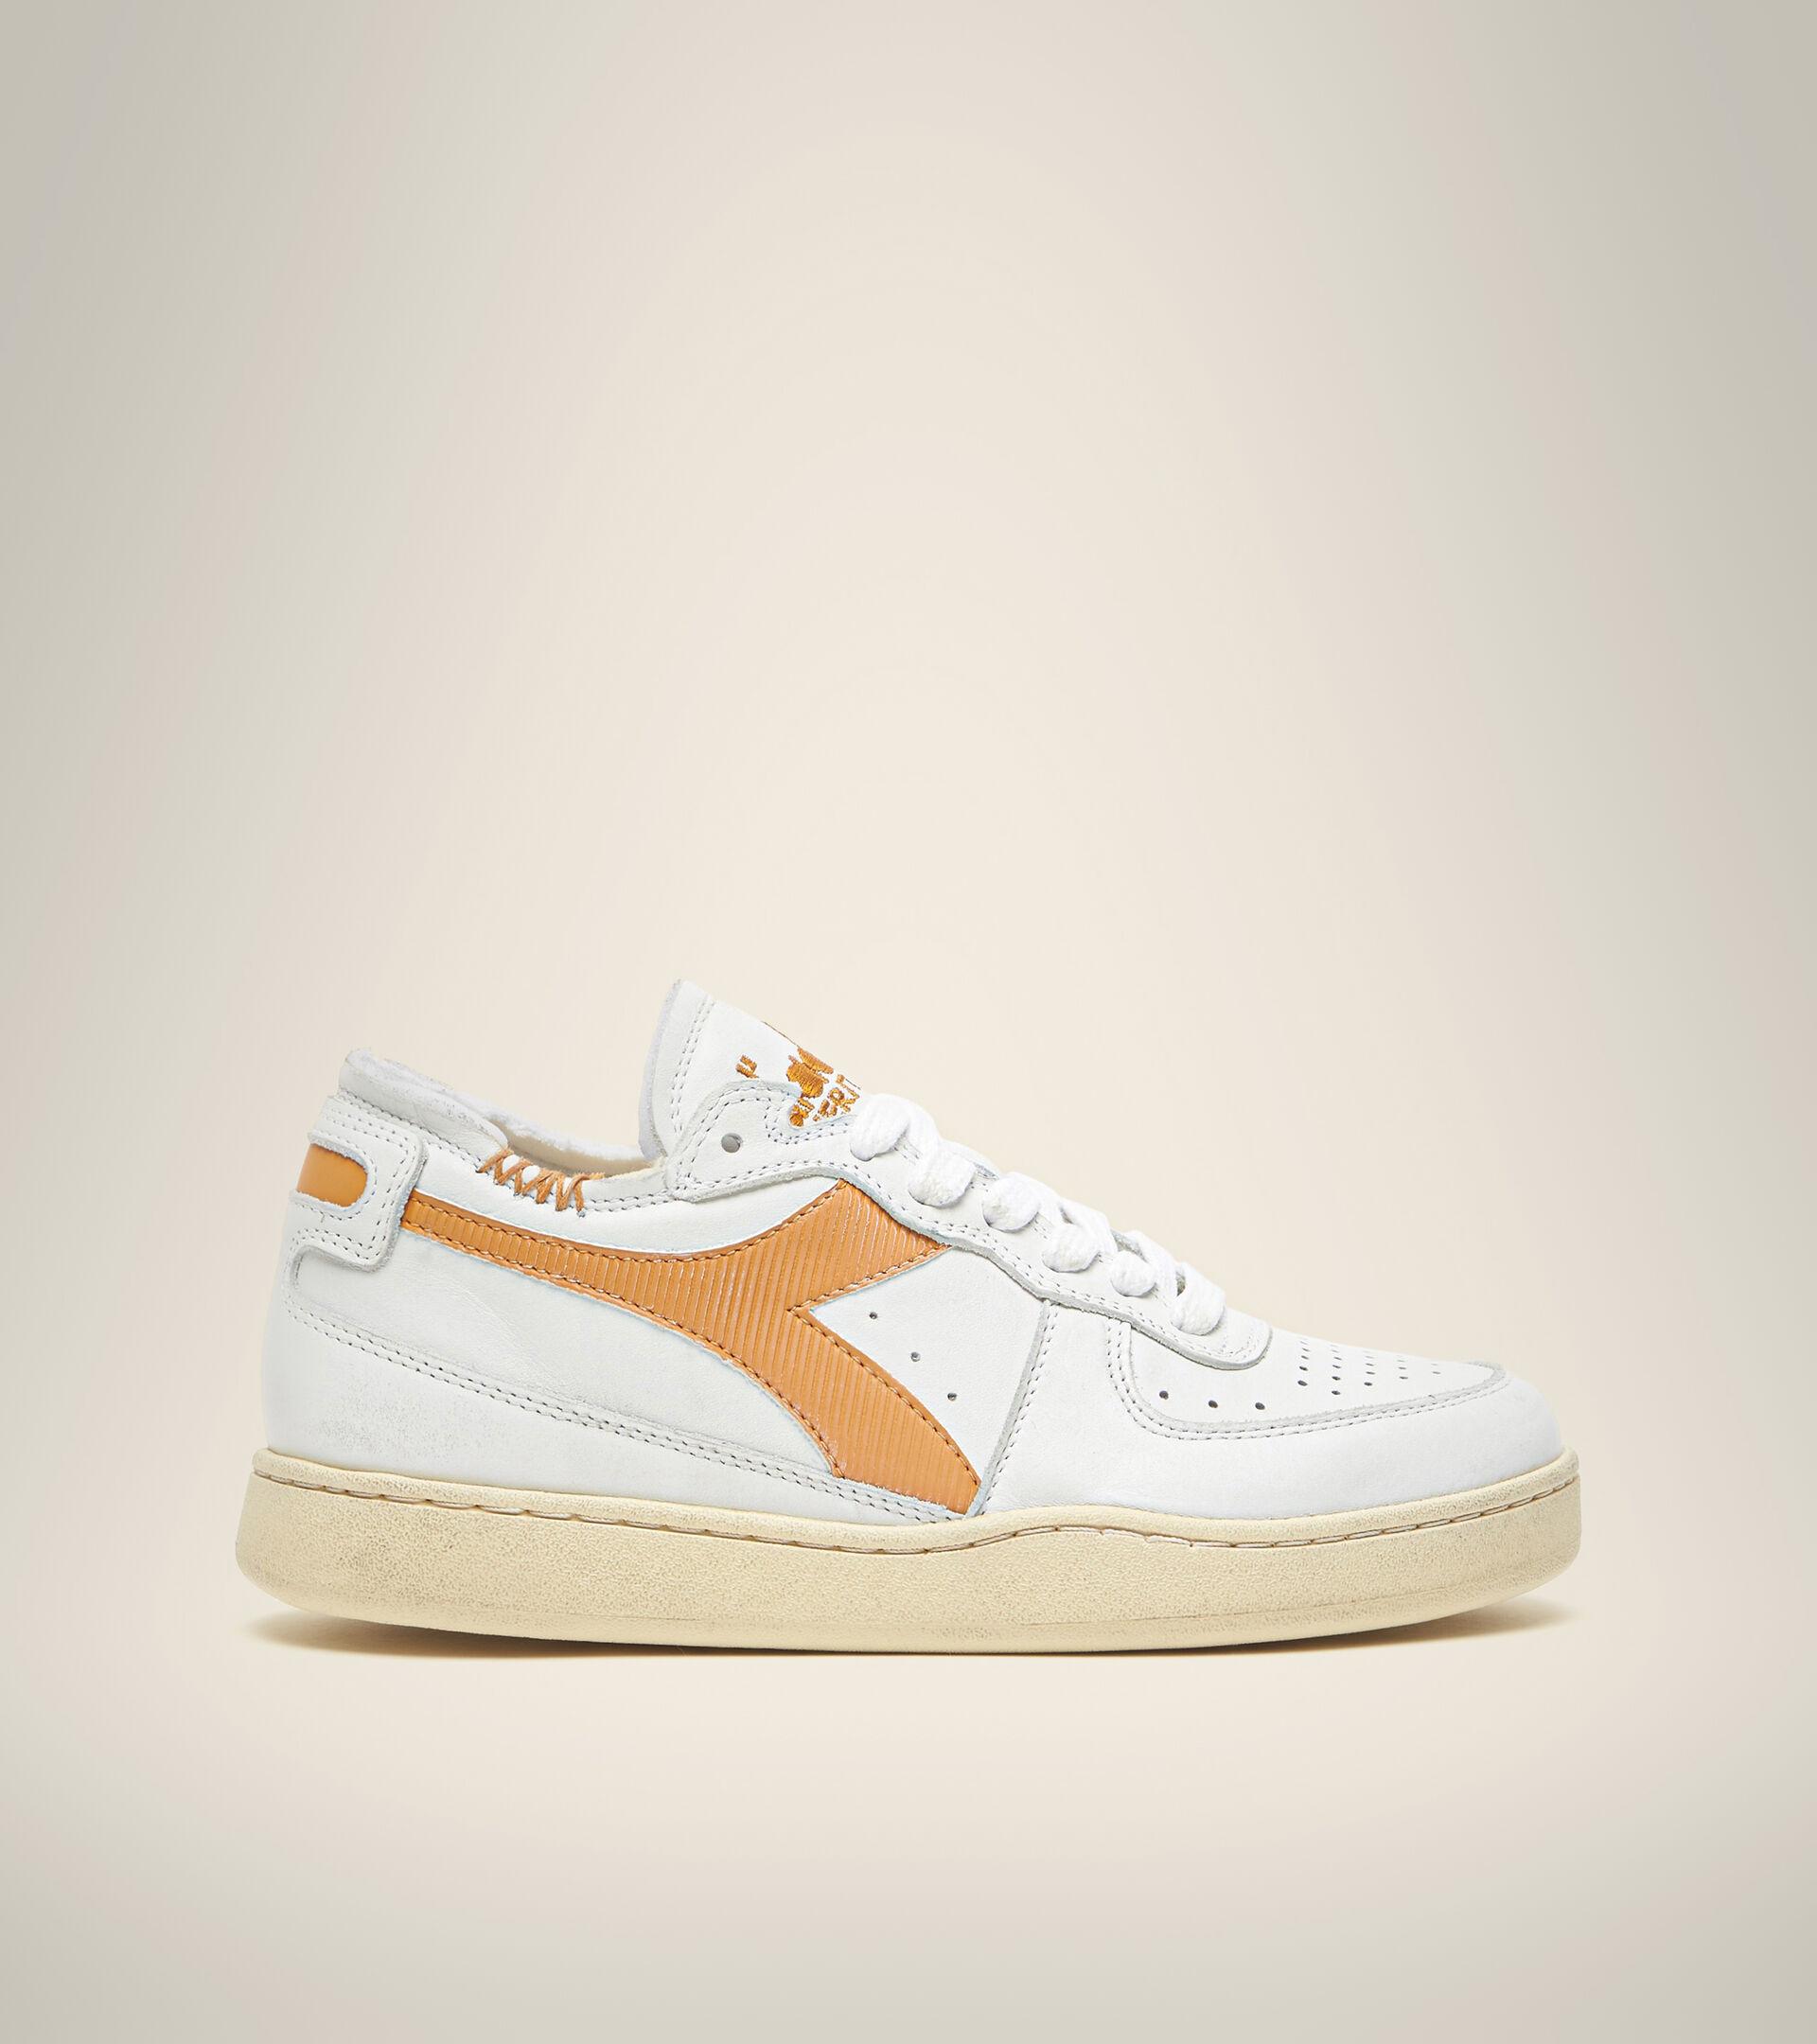 Heritage shoe - Unisex MI BASKET ROW CUT WHITE/NUGGET - Diadora